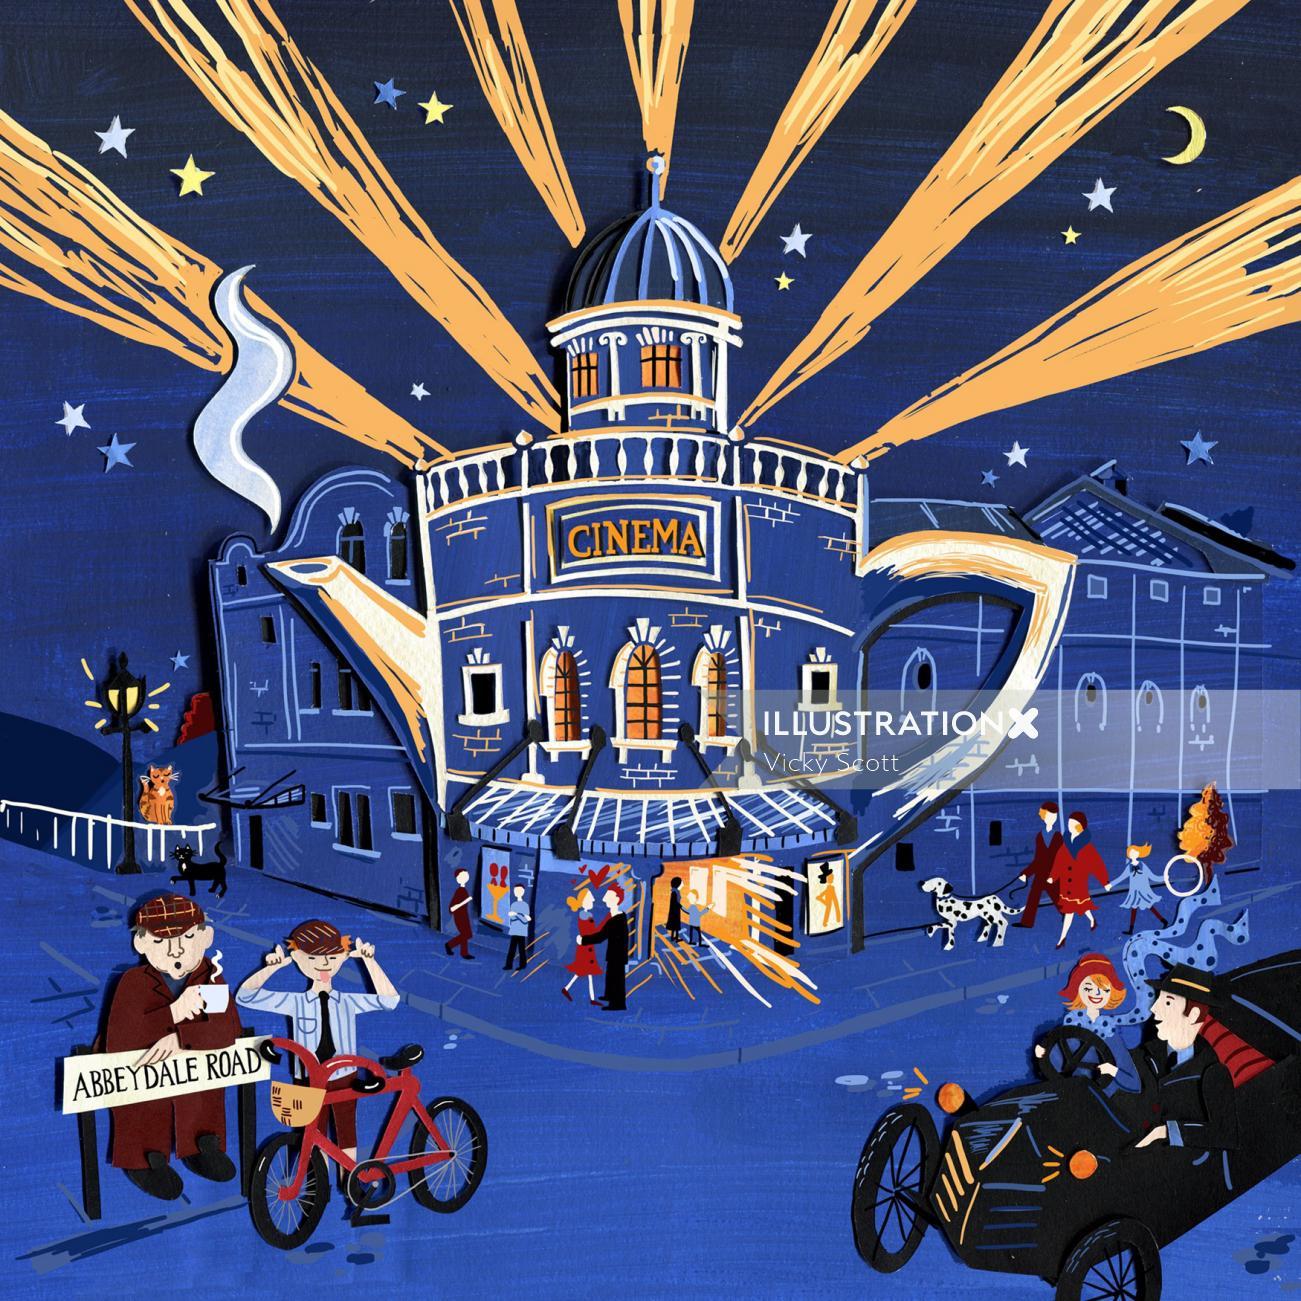 architecture, buildings, sheffield, art deco, crowd scene, nighttime, street scene, history, 1920s,